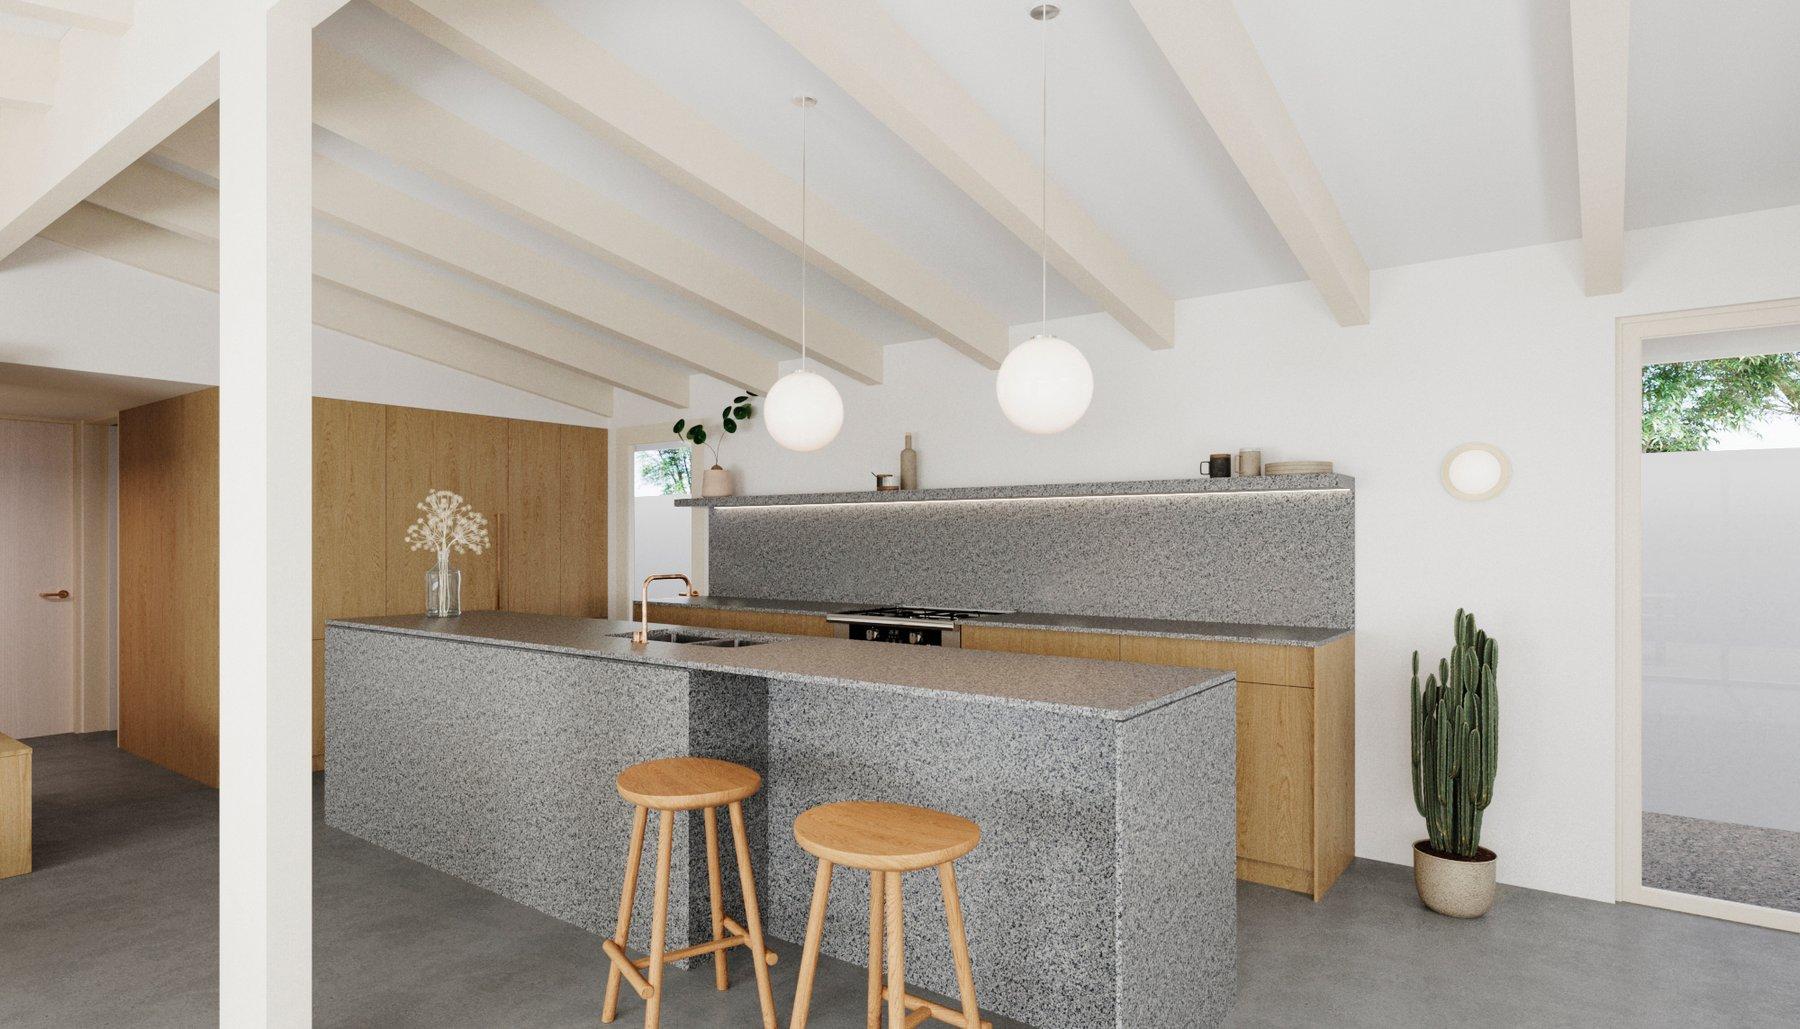 A granite kitchen island and seamless backsplash